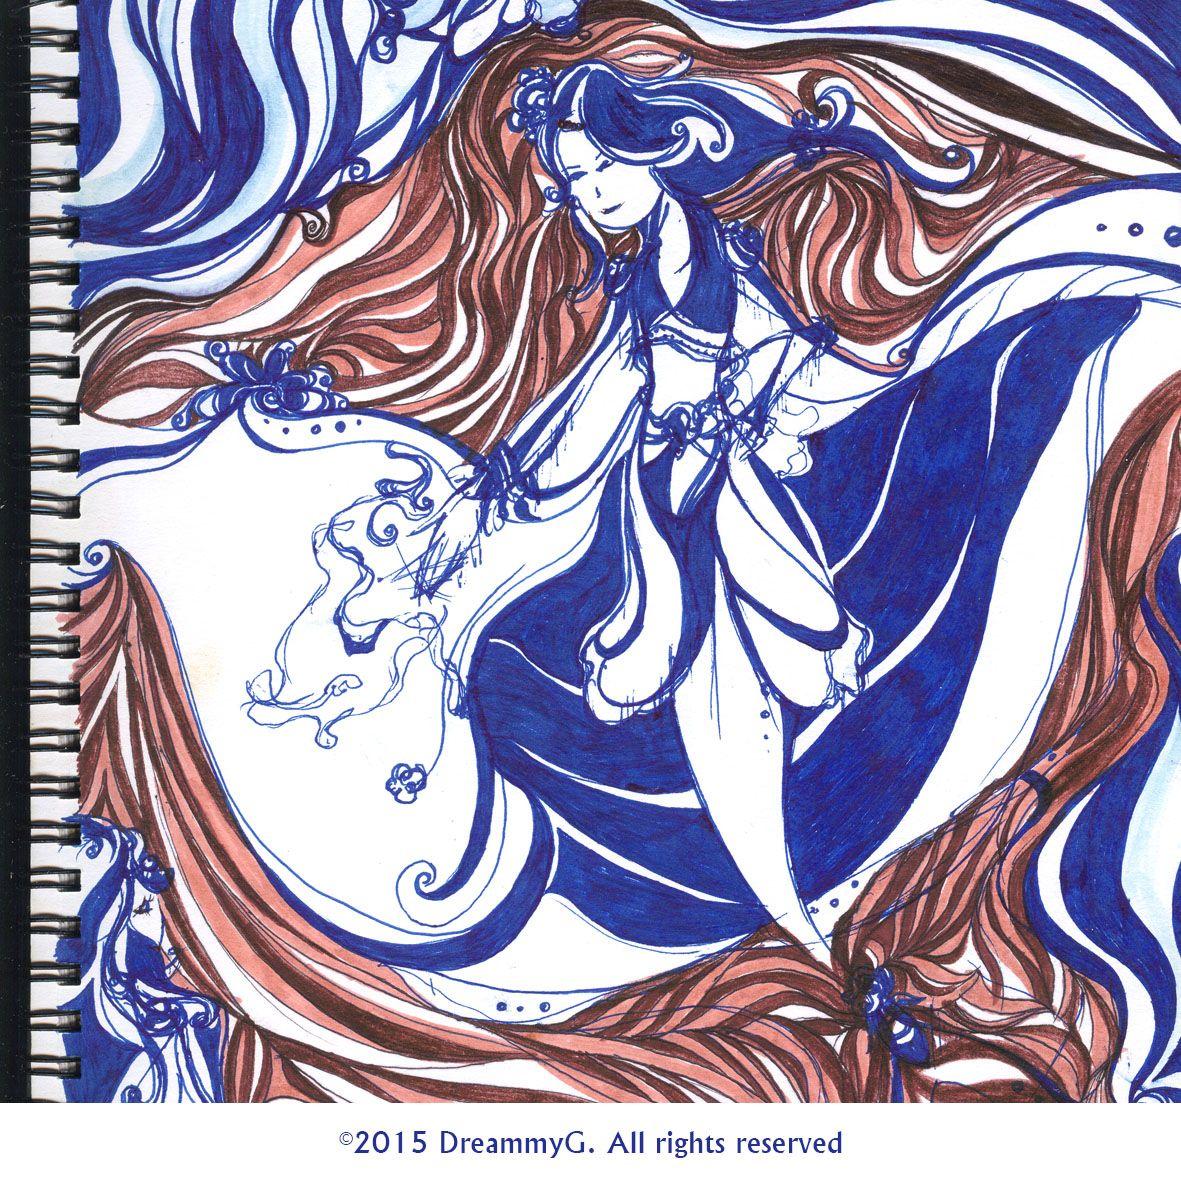 Artwork image by dreammy g on dreammyg art anime